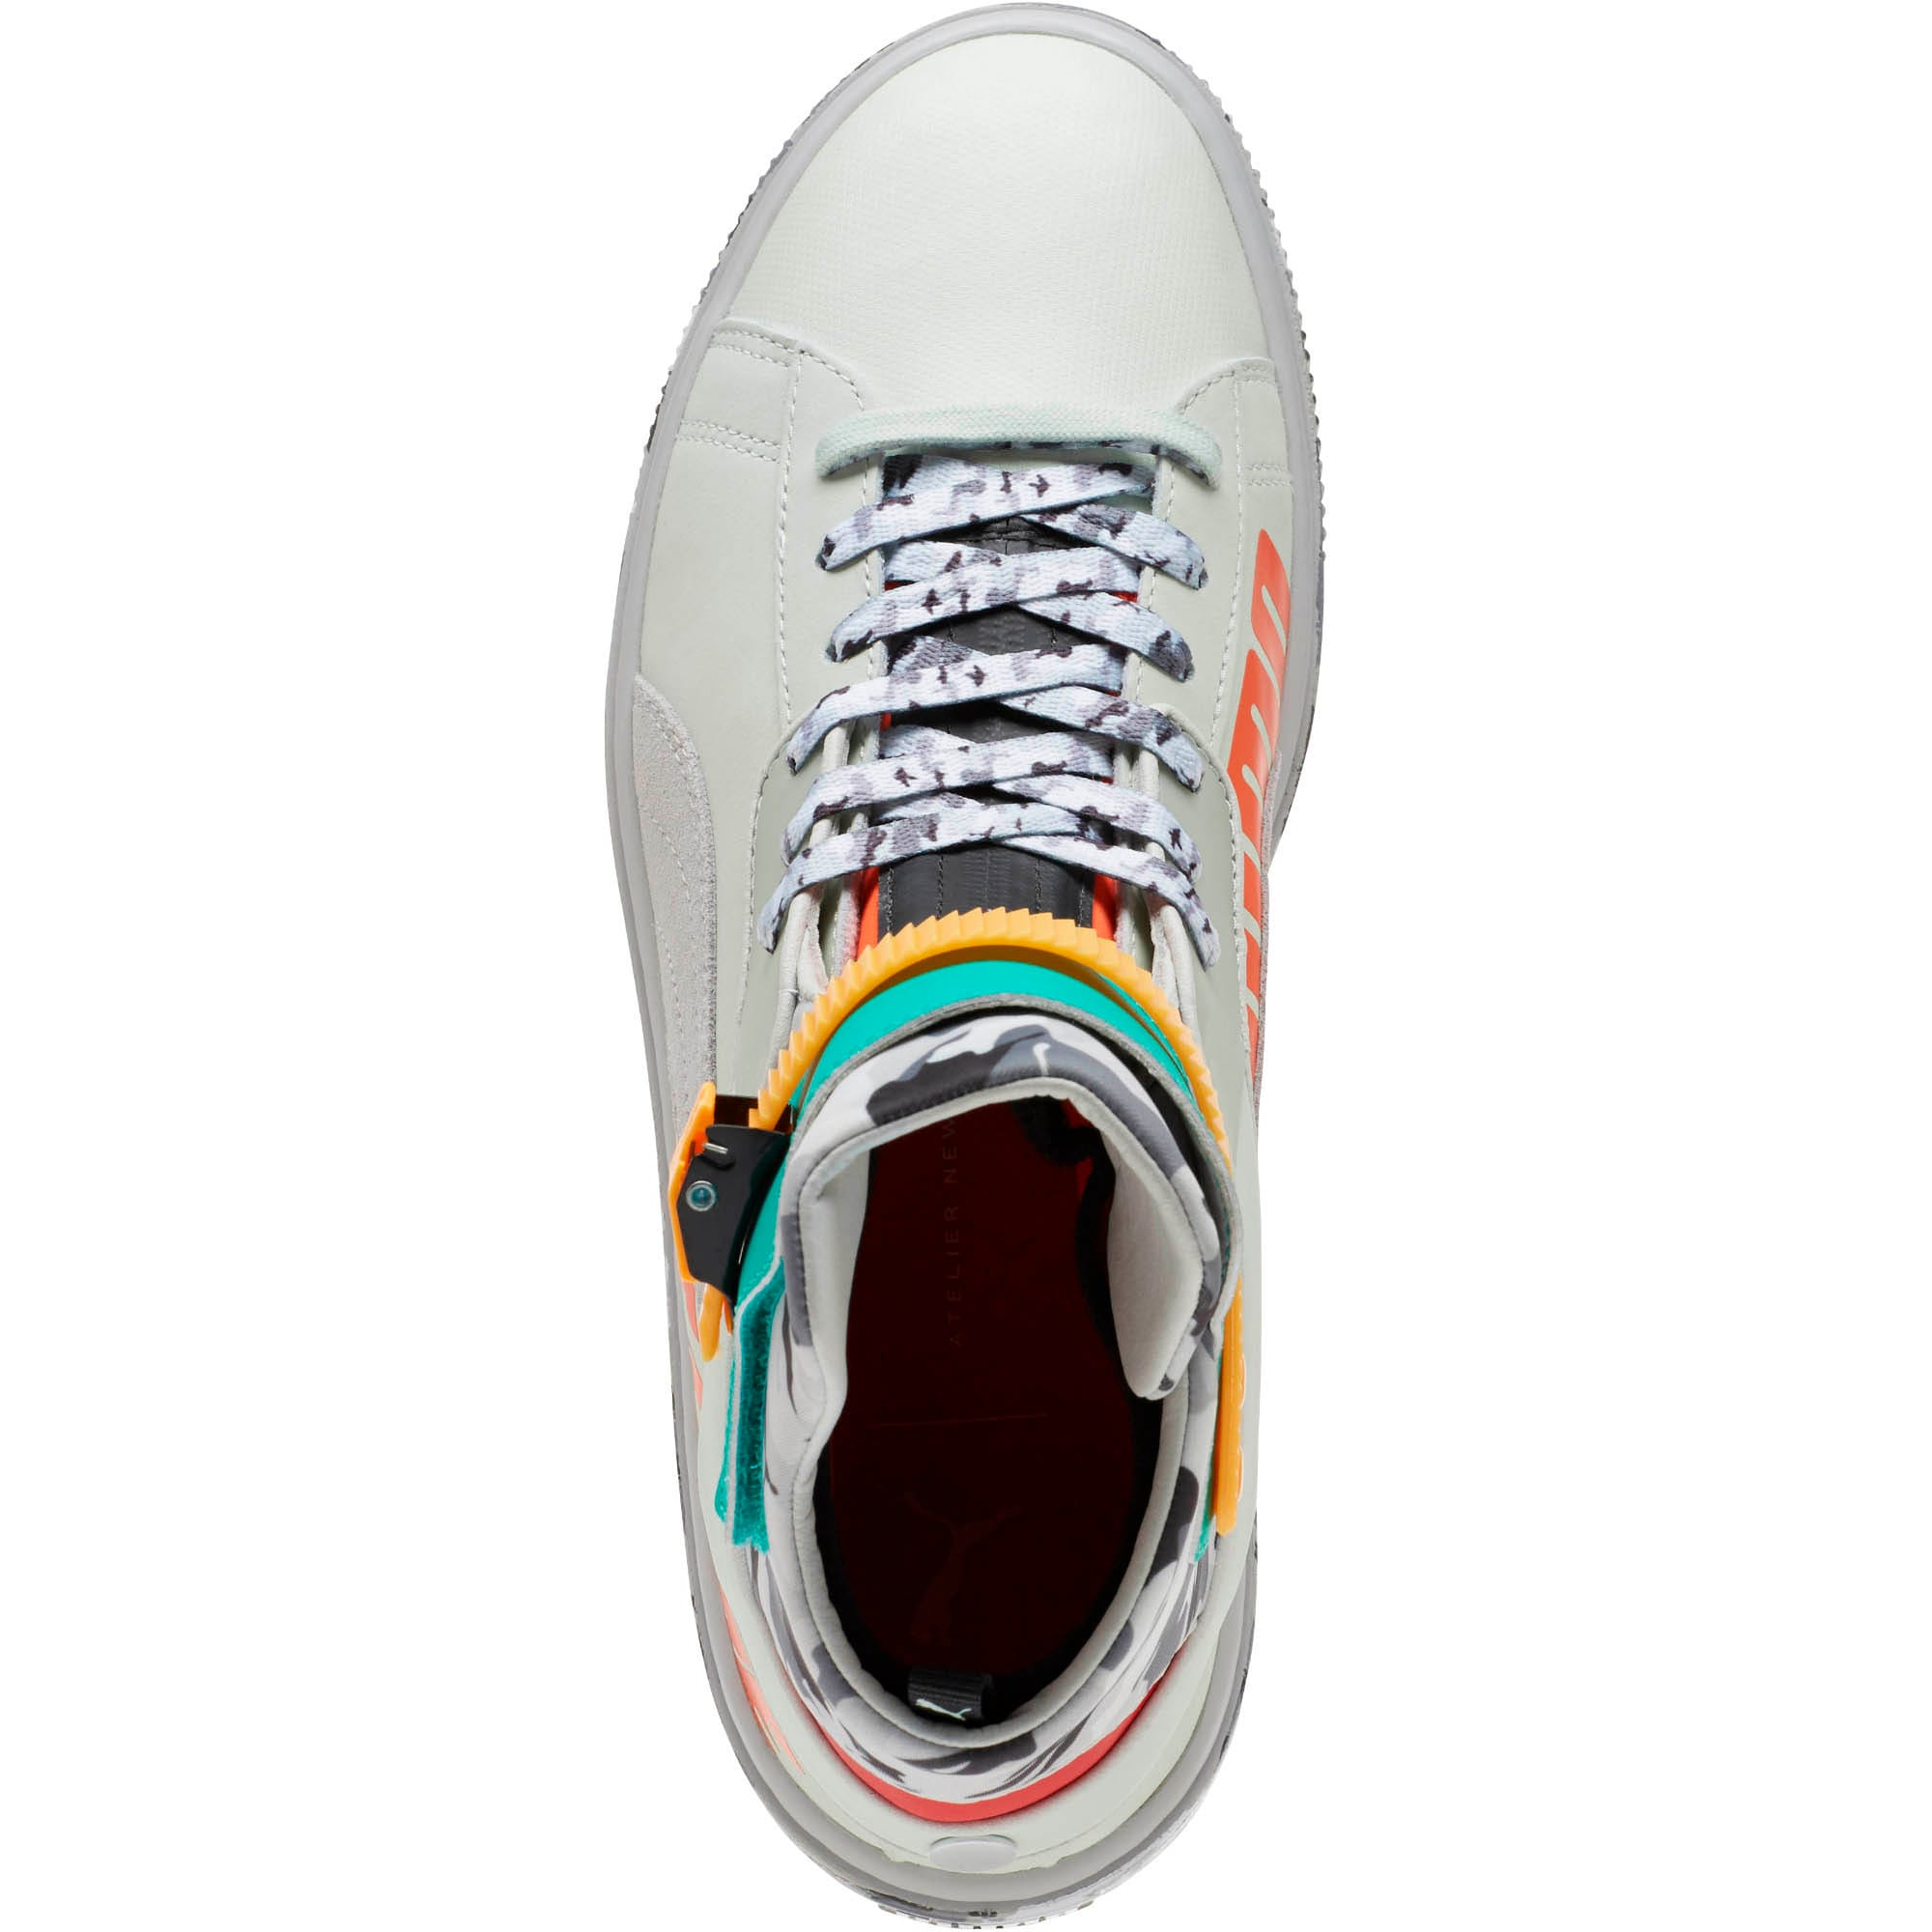 Thumbnail 5 of PUMA x ATELIER NEW REGIME Ren Boots, Green Lily-Gray Violet, medium